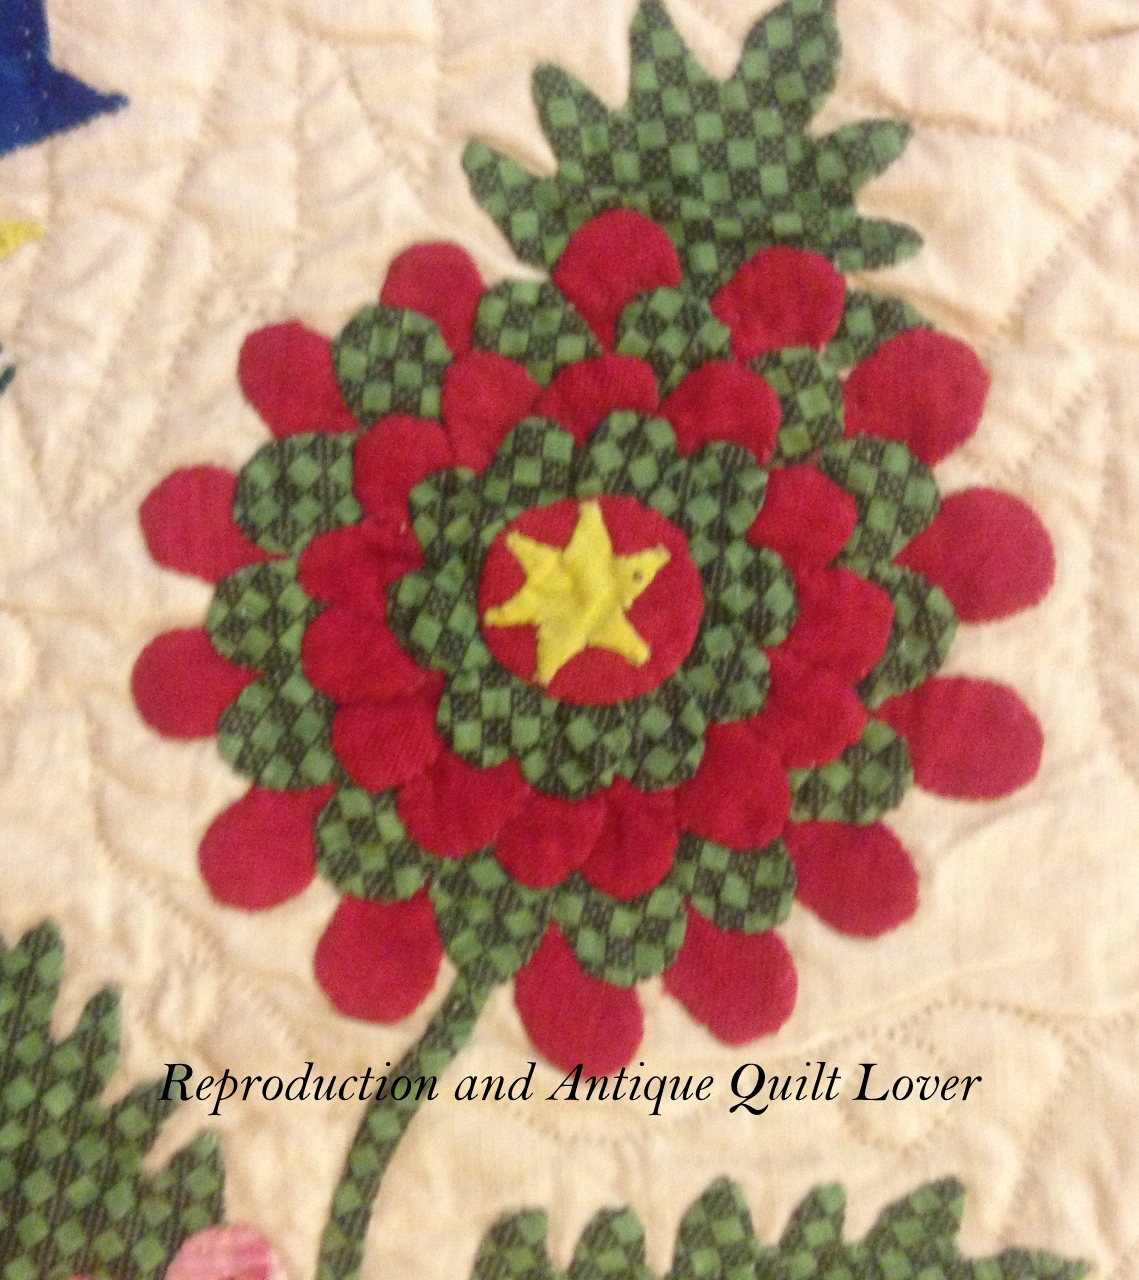 Repro Quilt Lover: April 2016 : repro quilt lover - Adamdwight.com